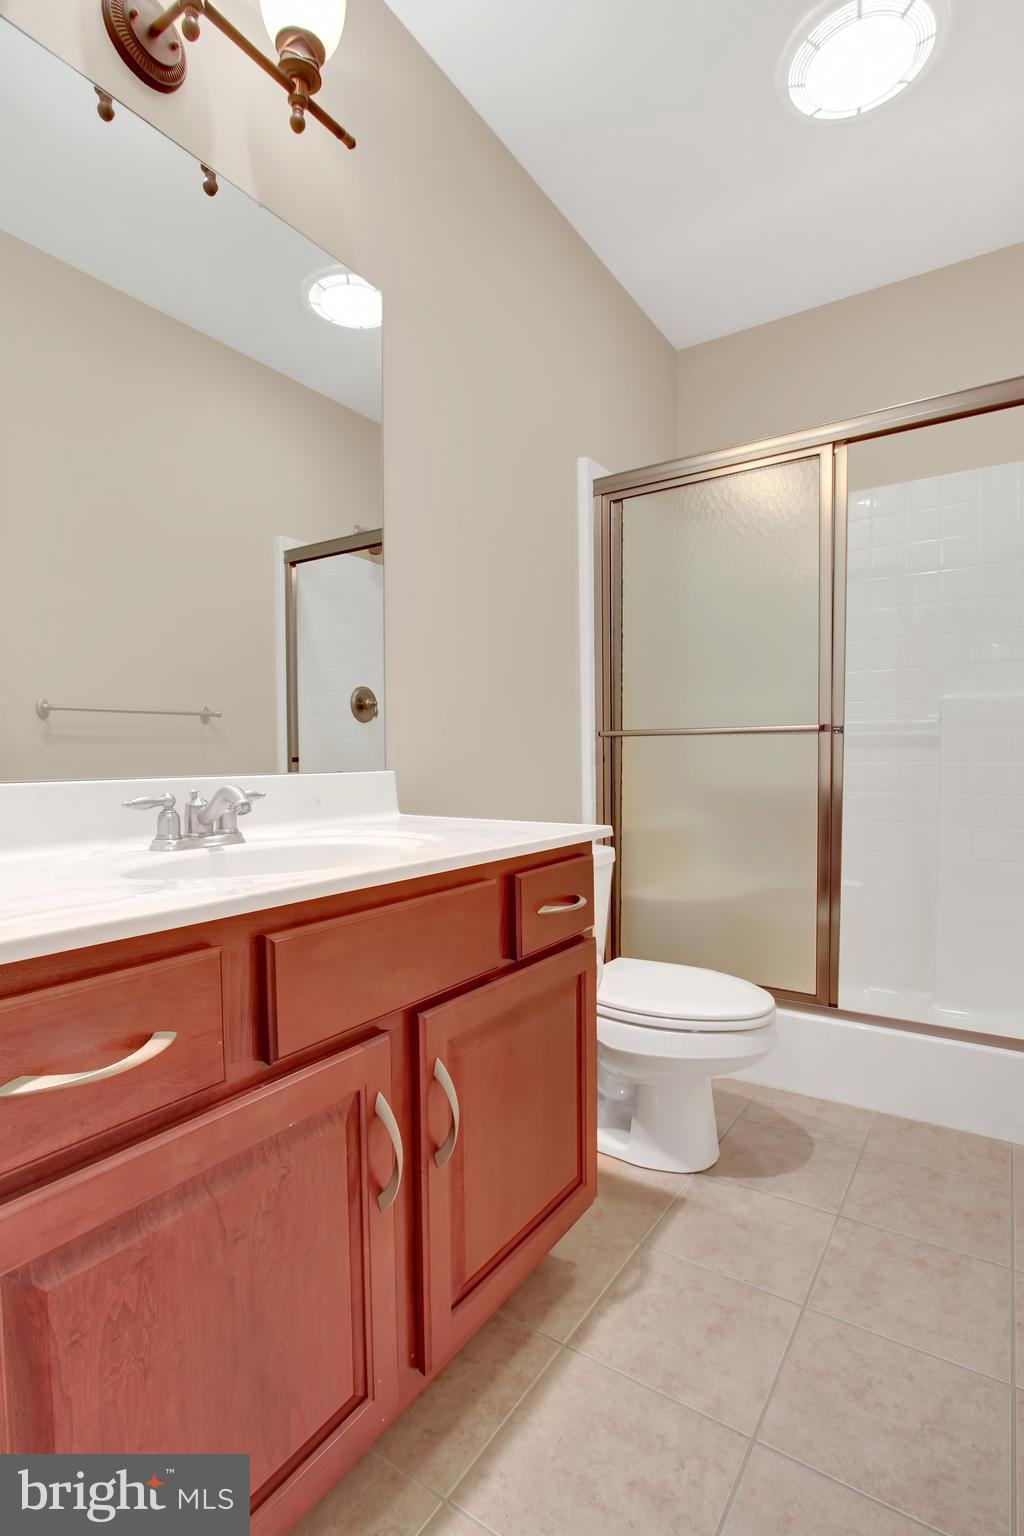 Full, modern bath with stall shower